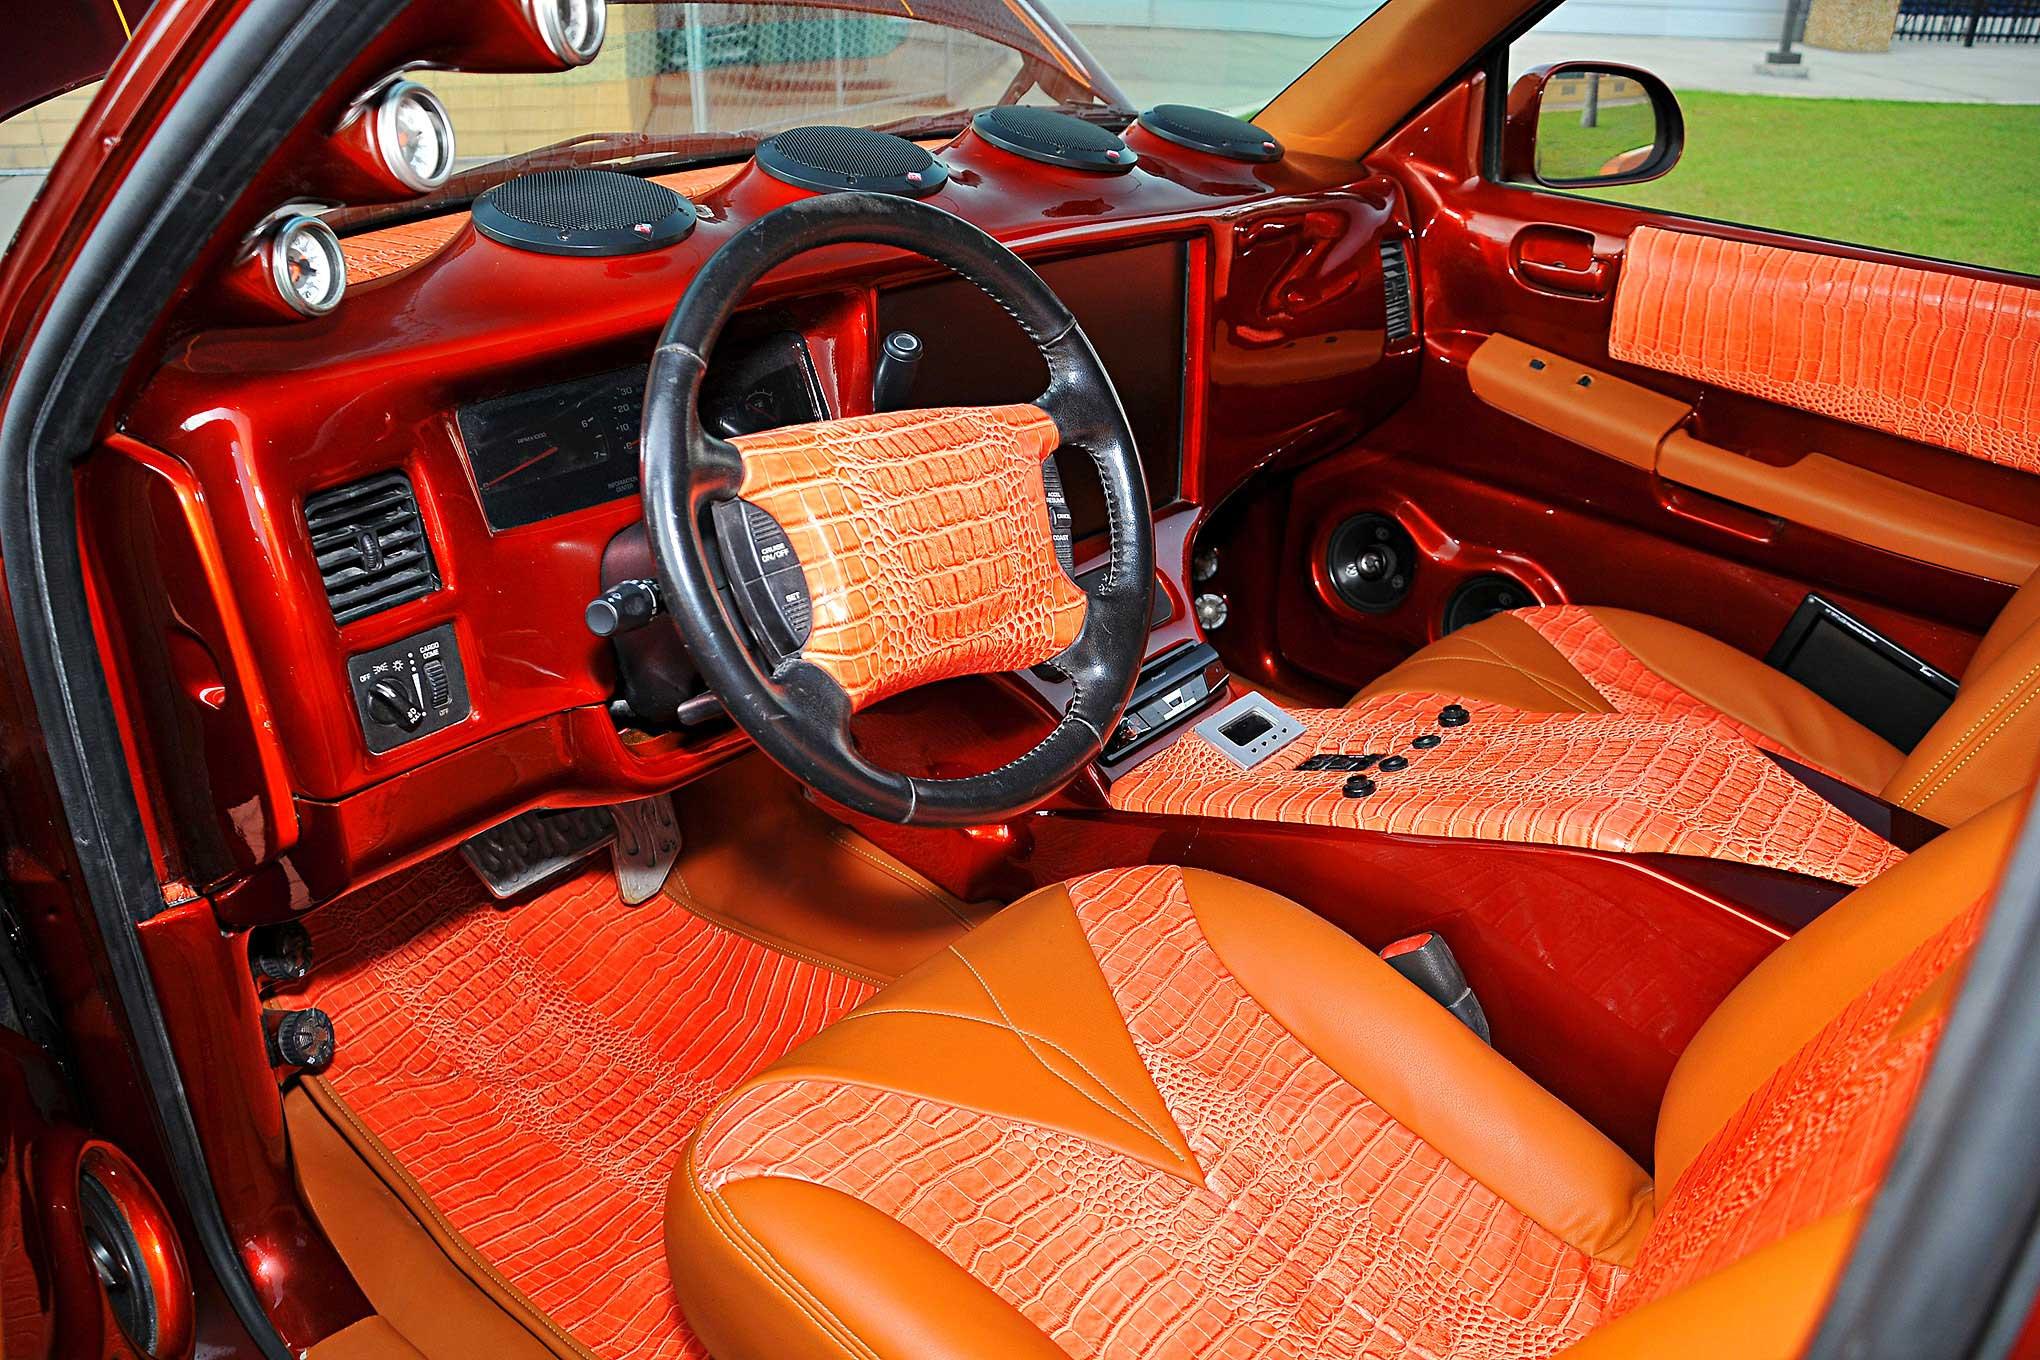 Dodge Dakota Orange Gator Skin Tan Vinyl Interior on Dodge Dakota Aftermarket Body Parts